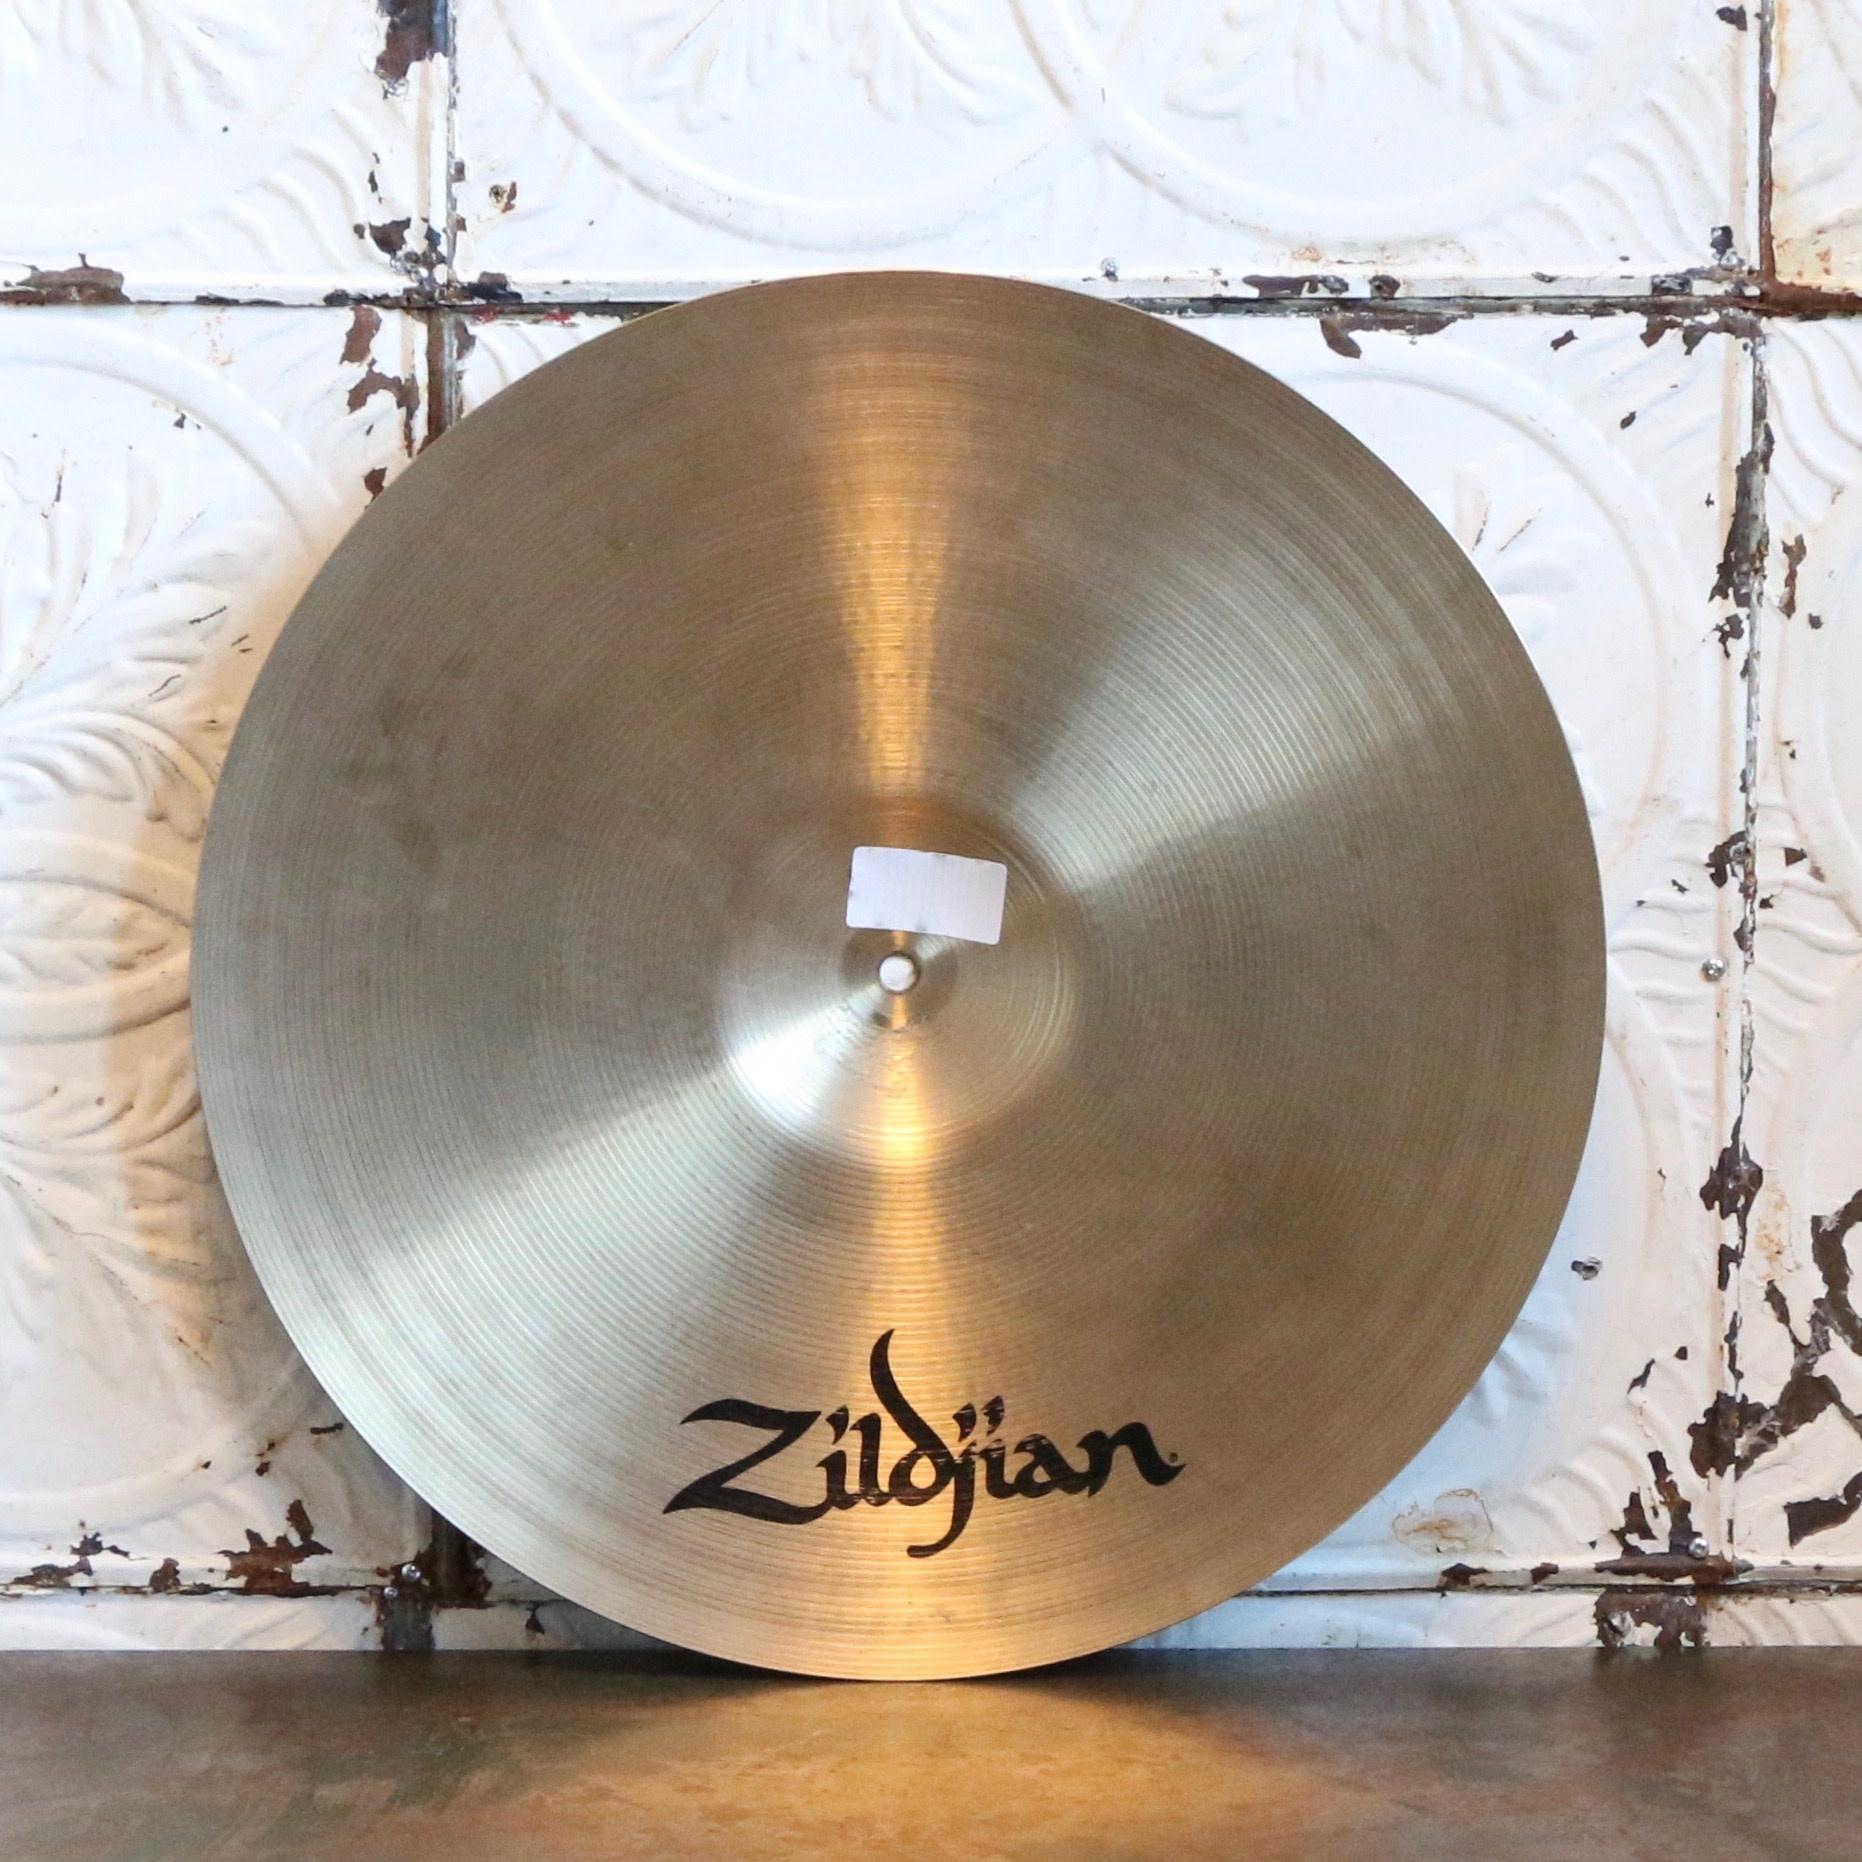 Zildjian Used Zildjian A Medium Ride Cymbal 20in